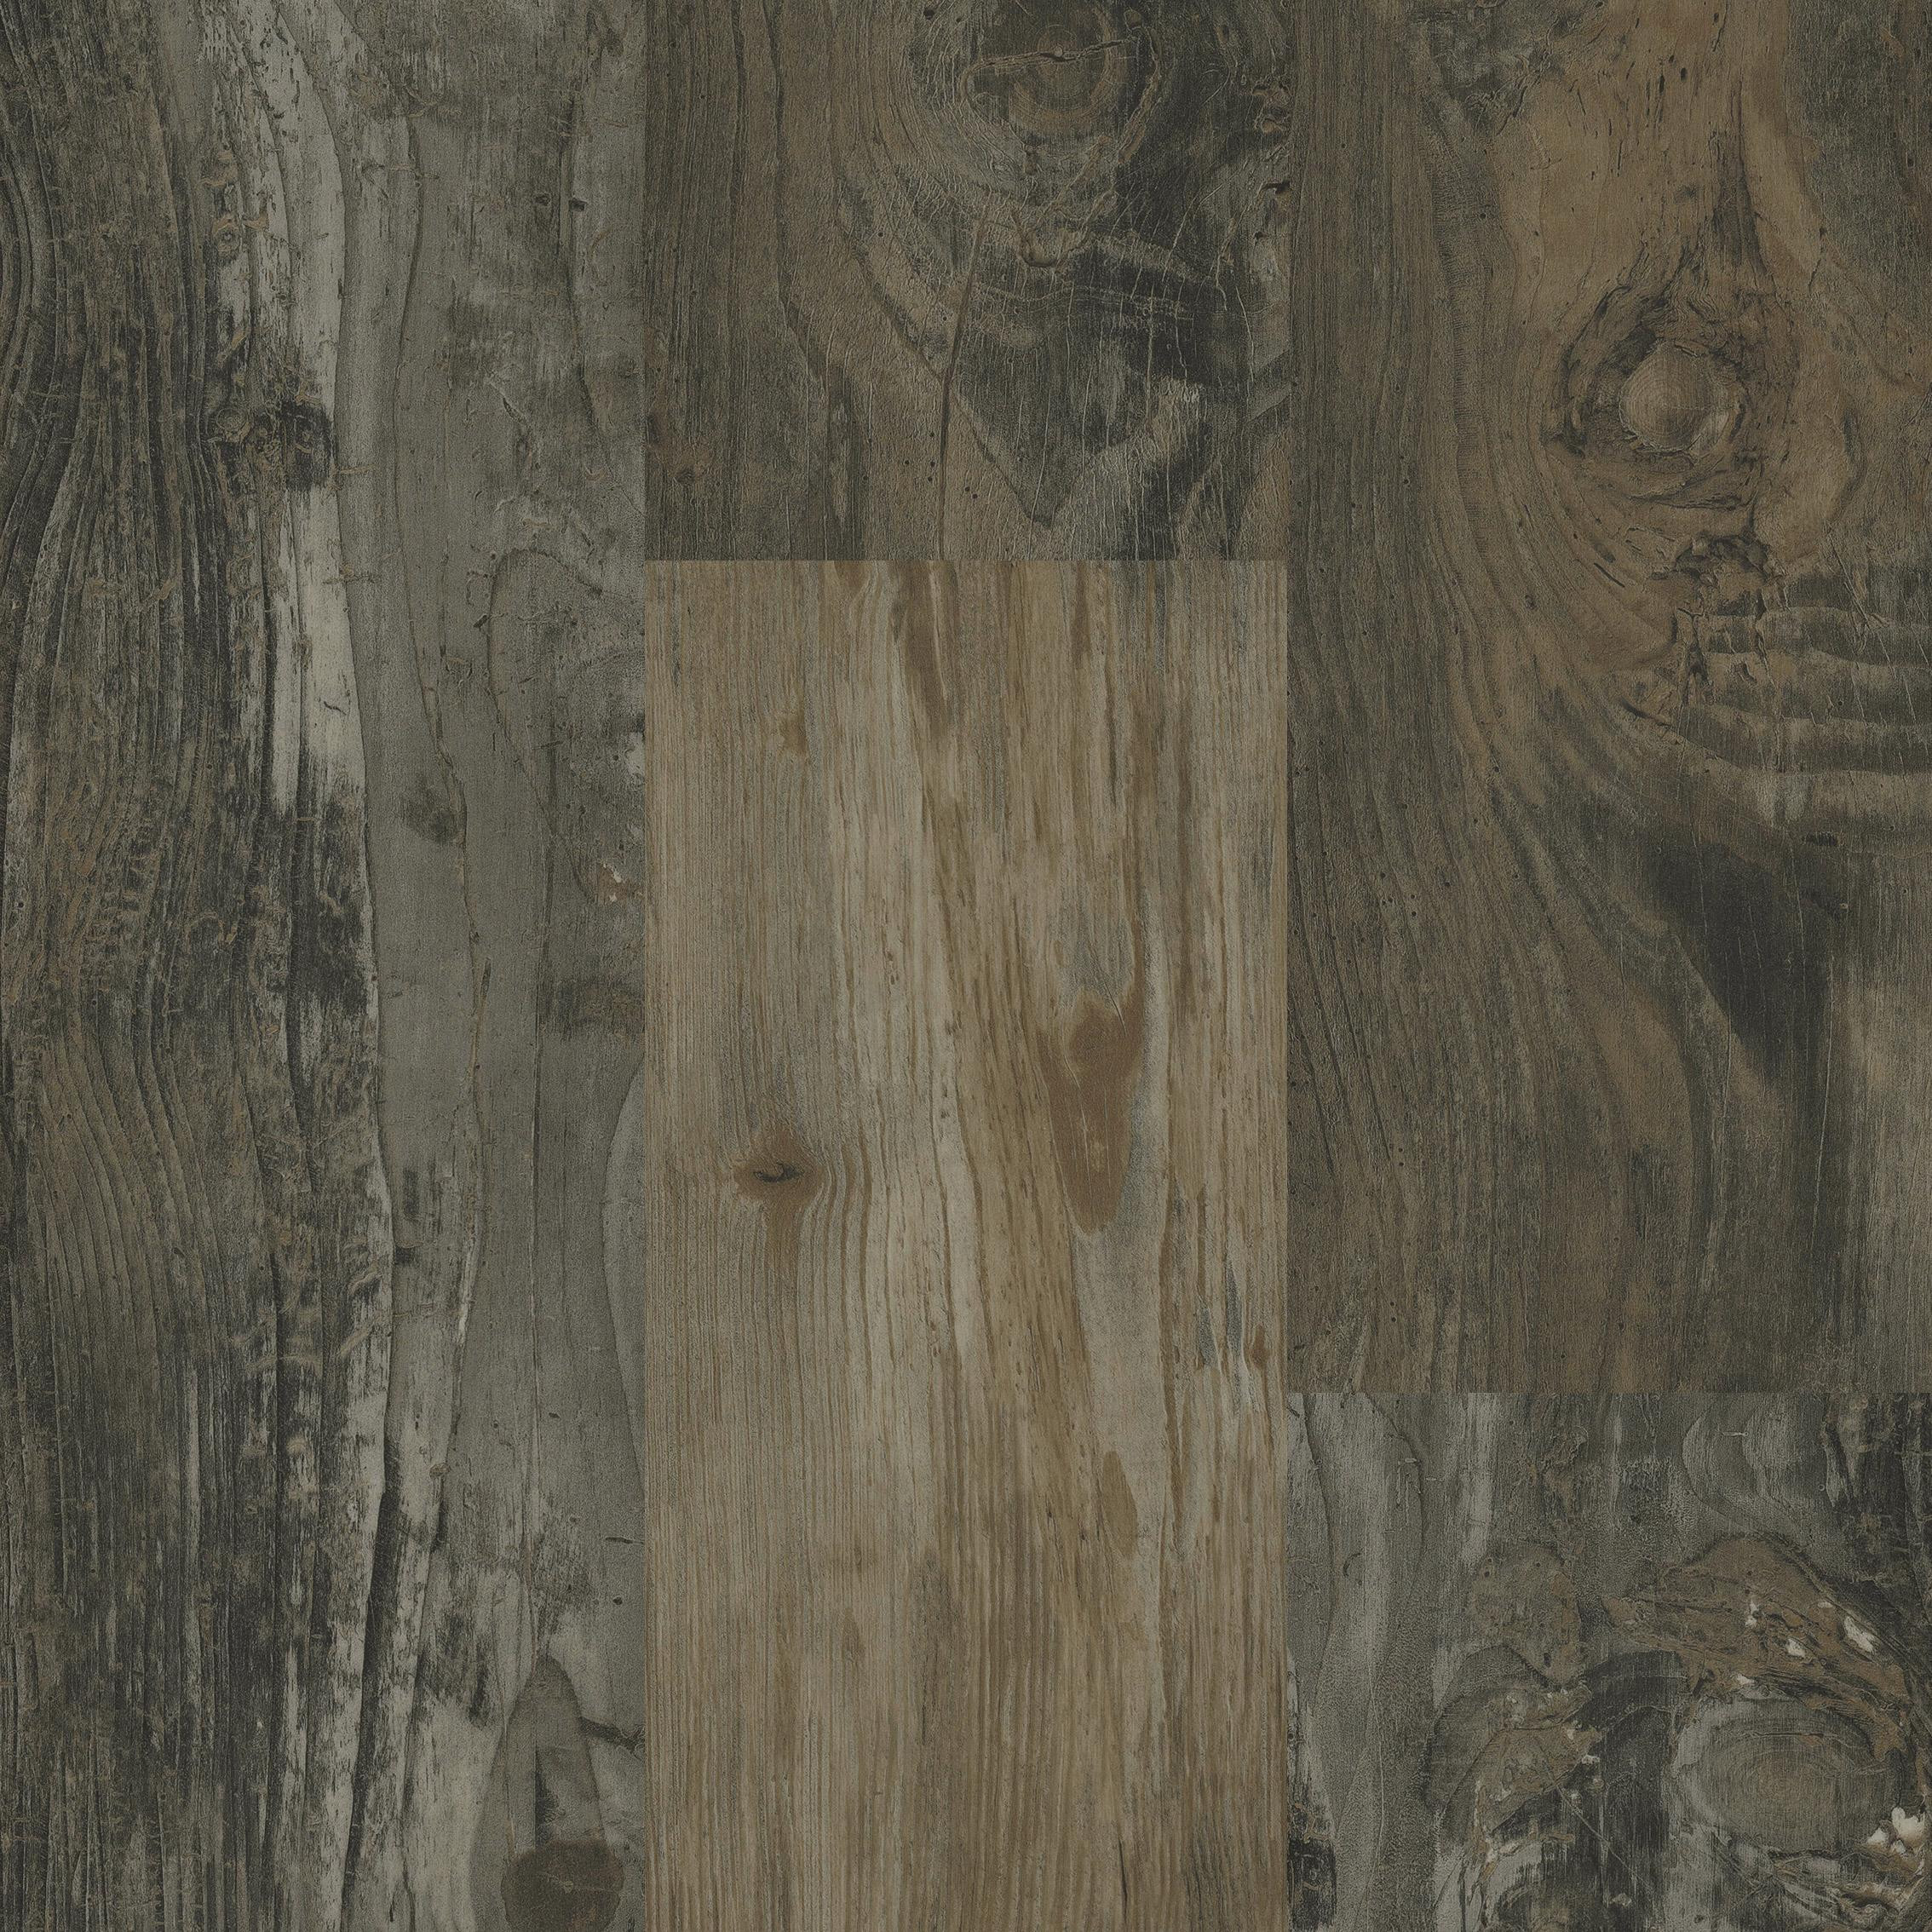 vinyl vs laminate hardwood flooring of moduleo vision bridge timber 7 56 click together luxury vinyl plank for moduleo vision bridge timber 7 56 click together luxury vinyl plank 60231